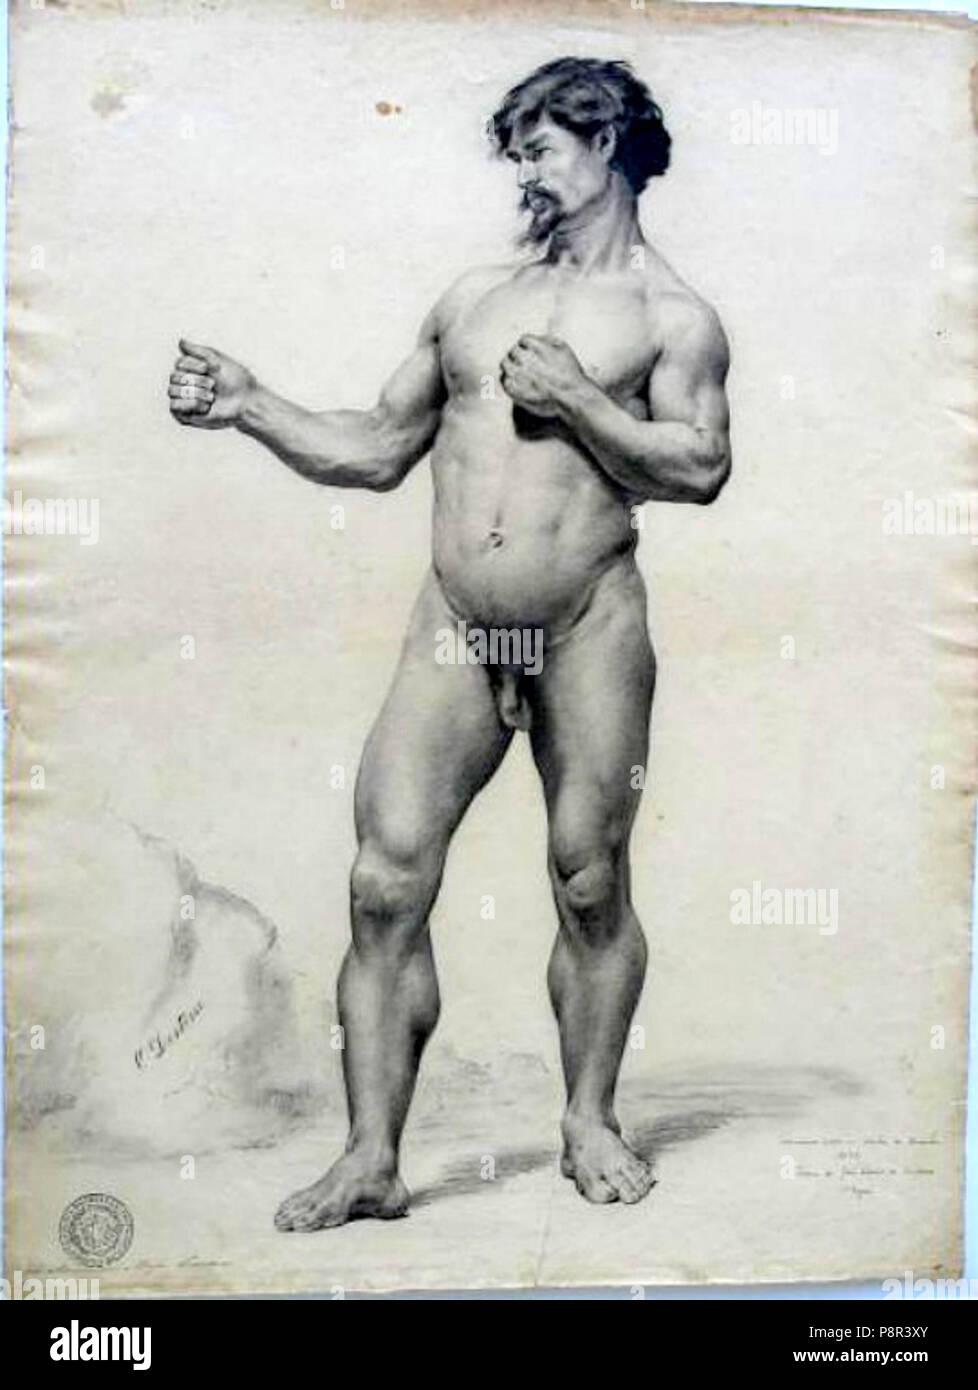 353 José Maria de Medeiros - Nu masculino (académico) Imagen De Stock